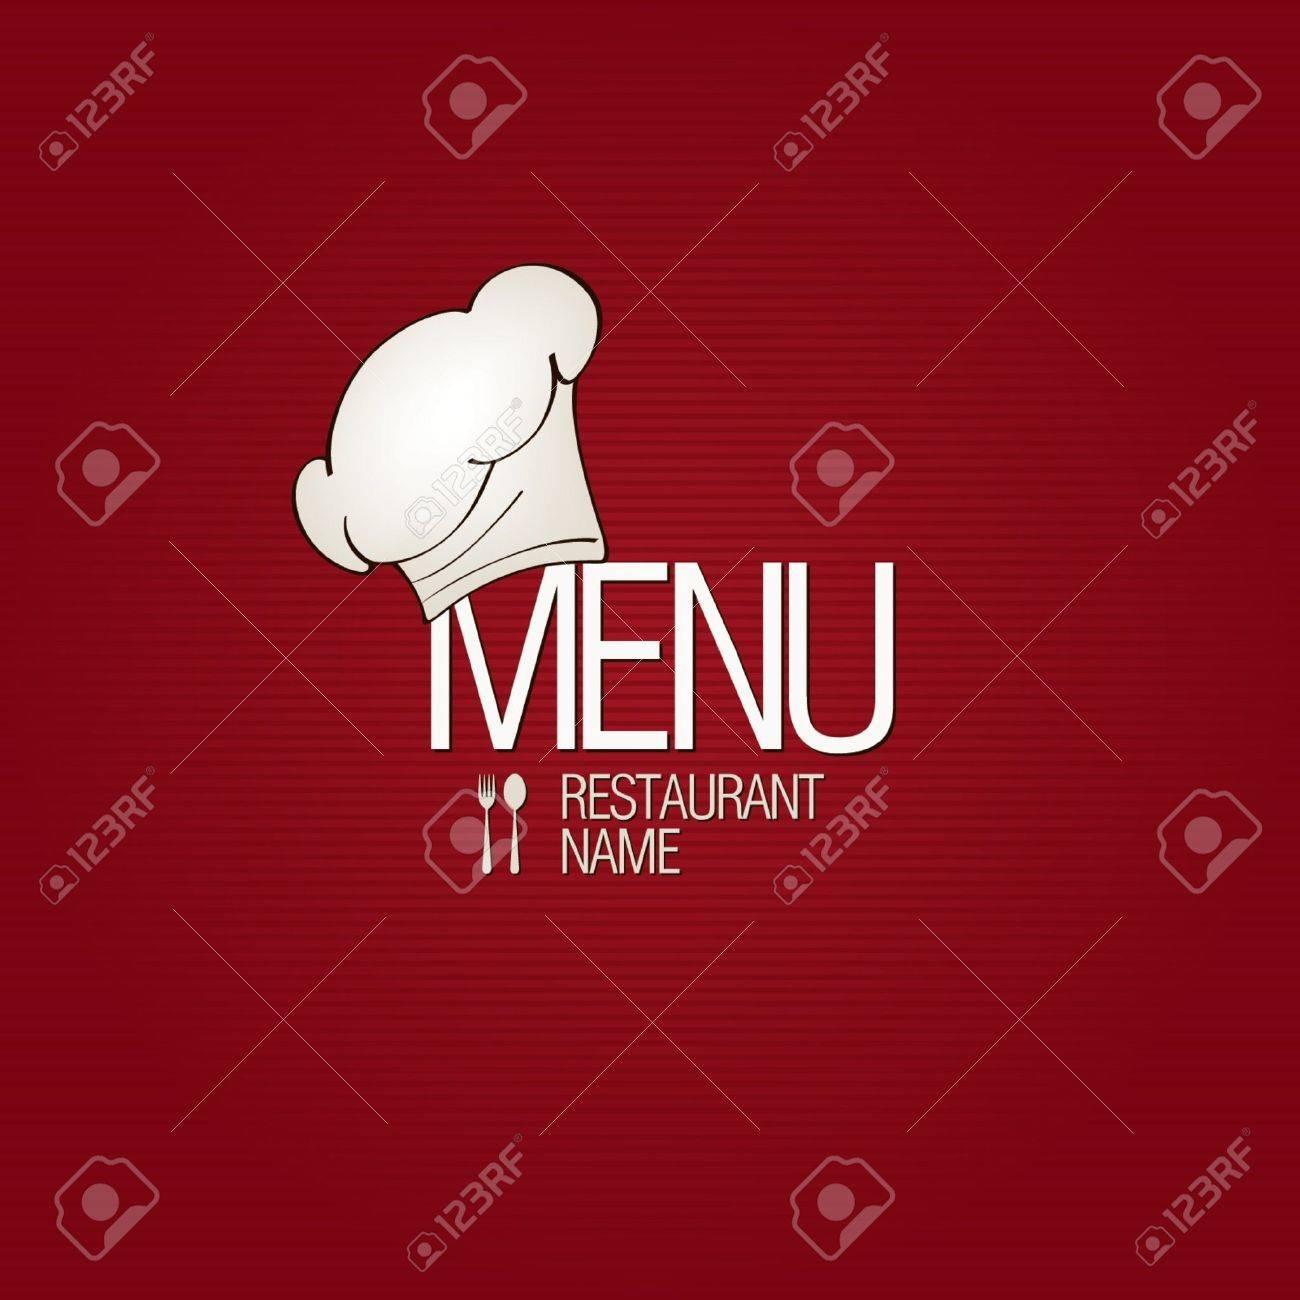 Restaurant menu Stock Vector - 11023704